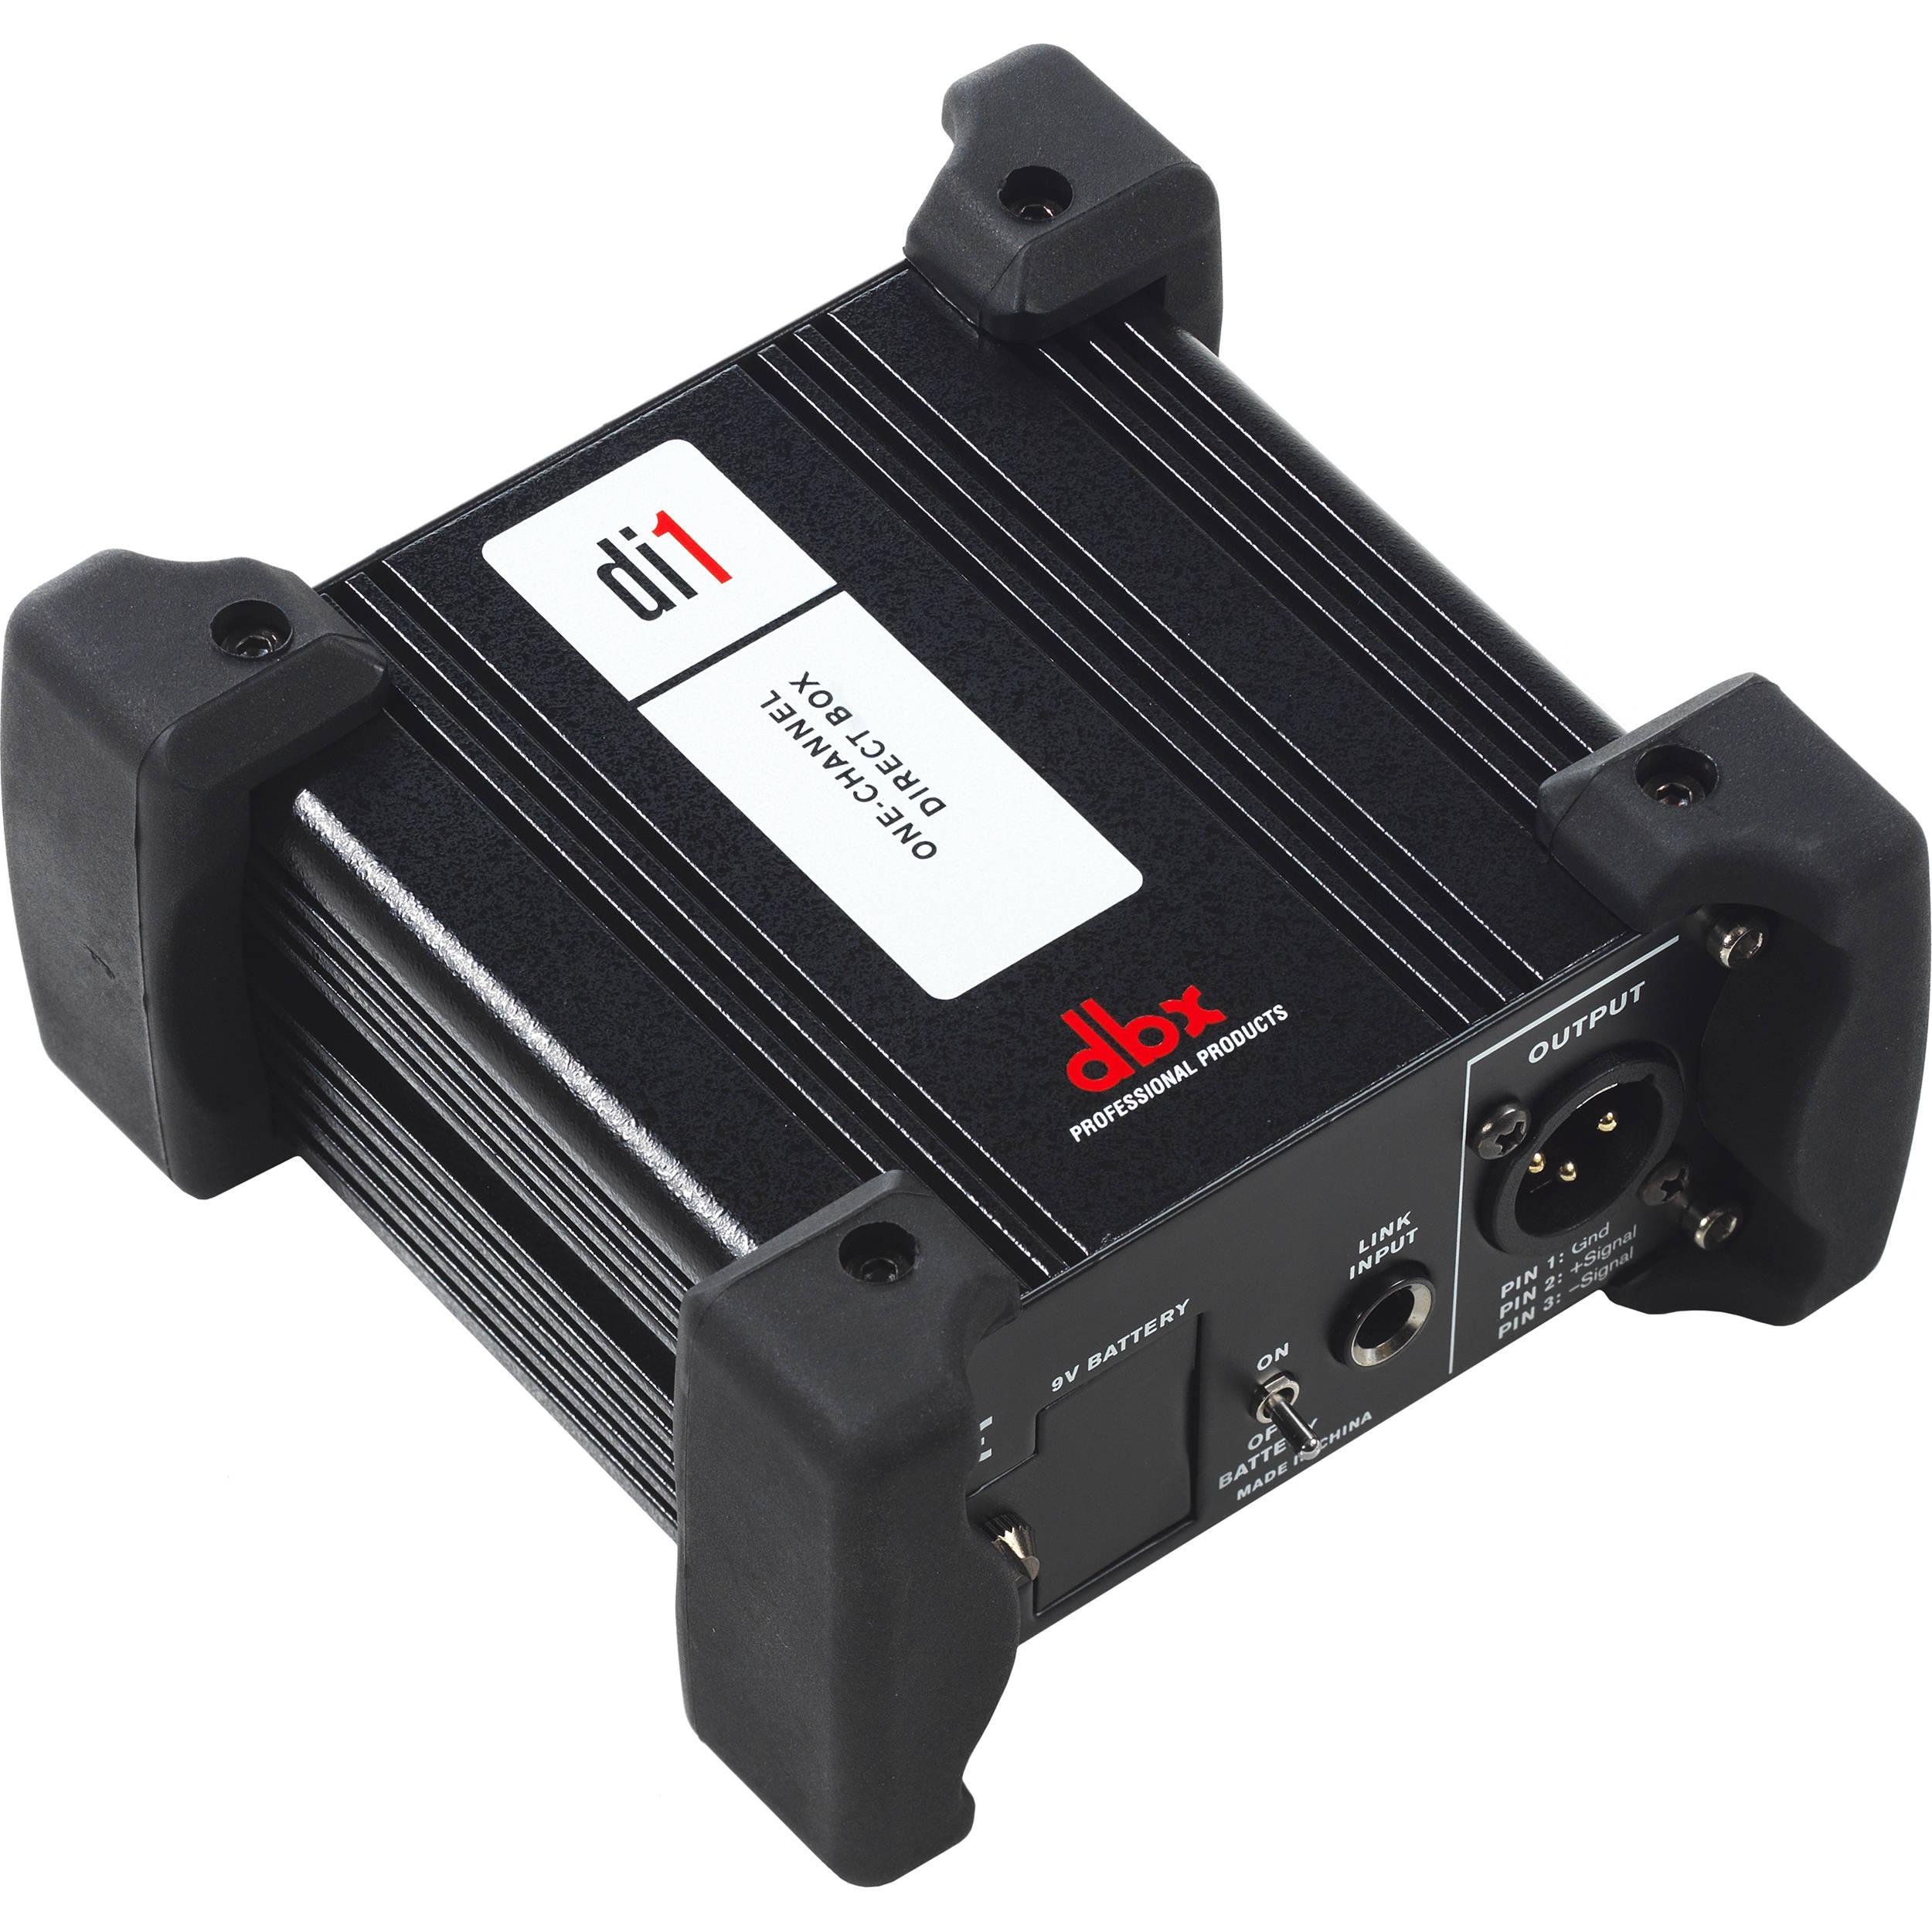 Dbx Di1 Active Direct Box Bh Photo Video China Circuit Breaker